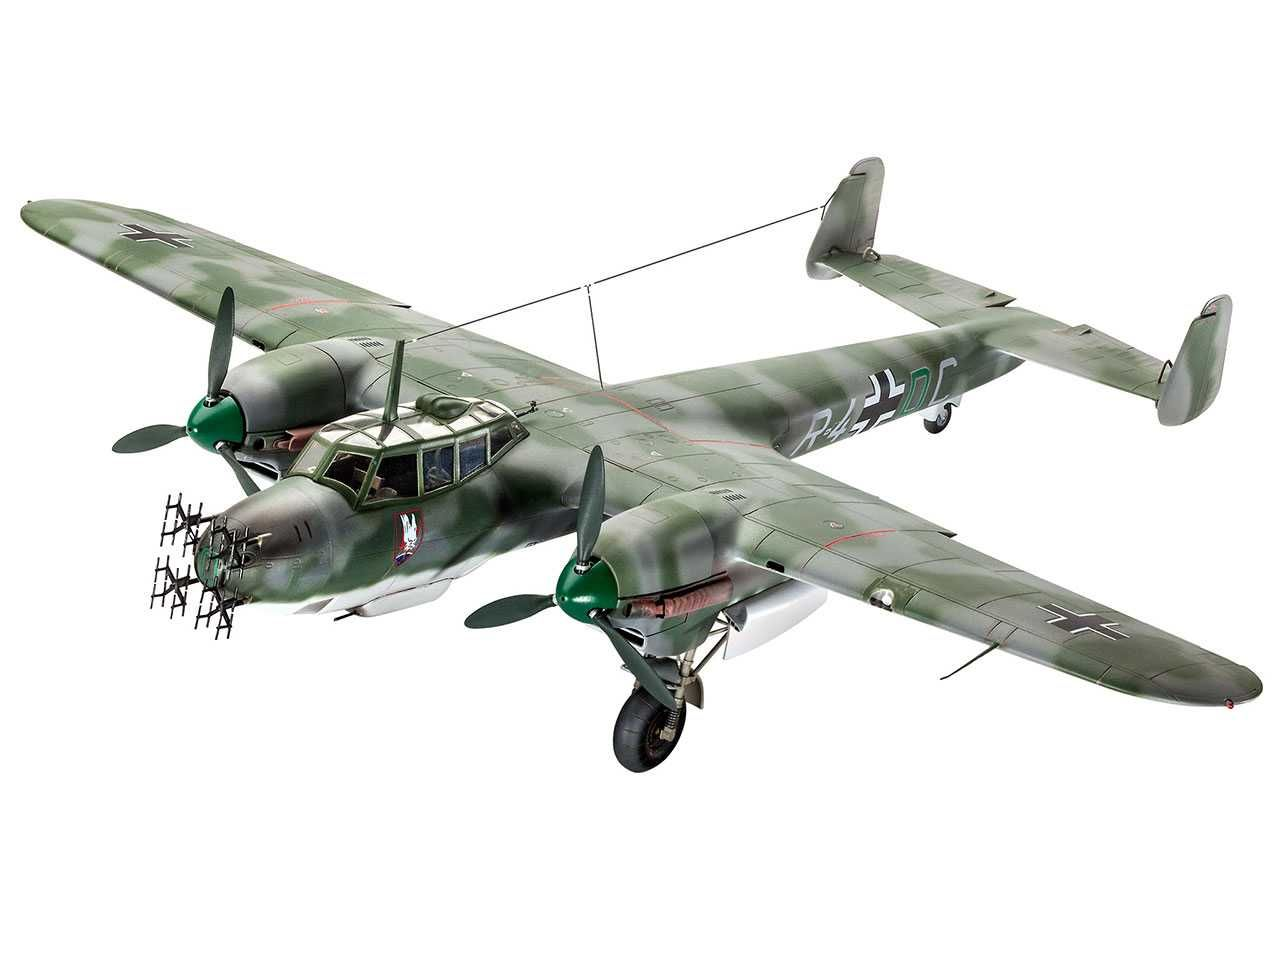 Plastic ModelKit letadlo 04925 - Dornier Do 215 B-5 Nightfighter (1:48) Plastikové modely